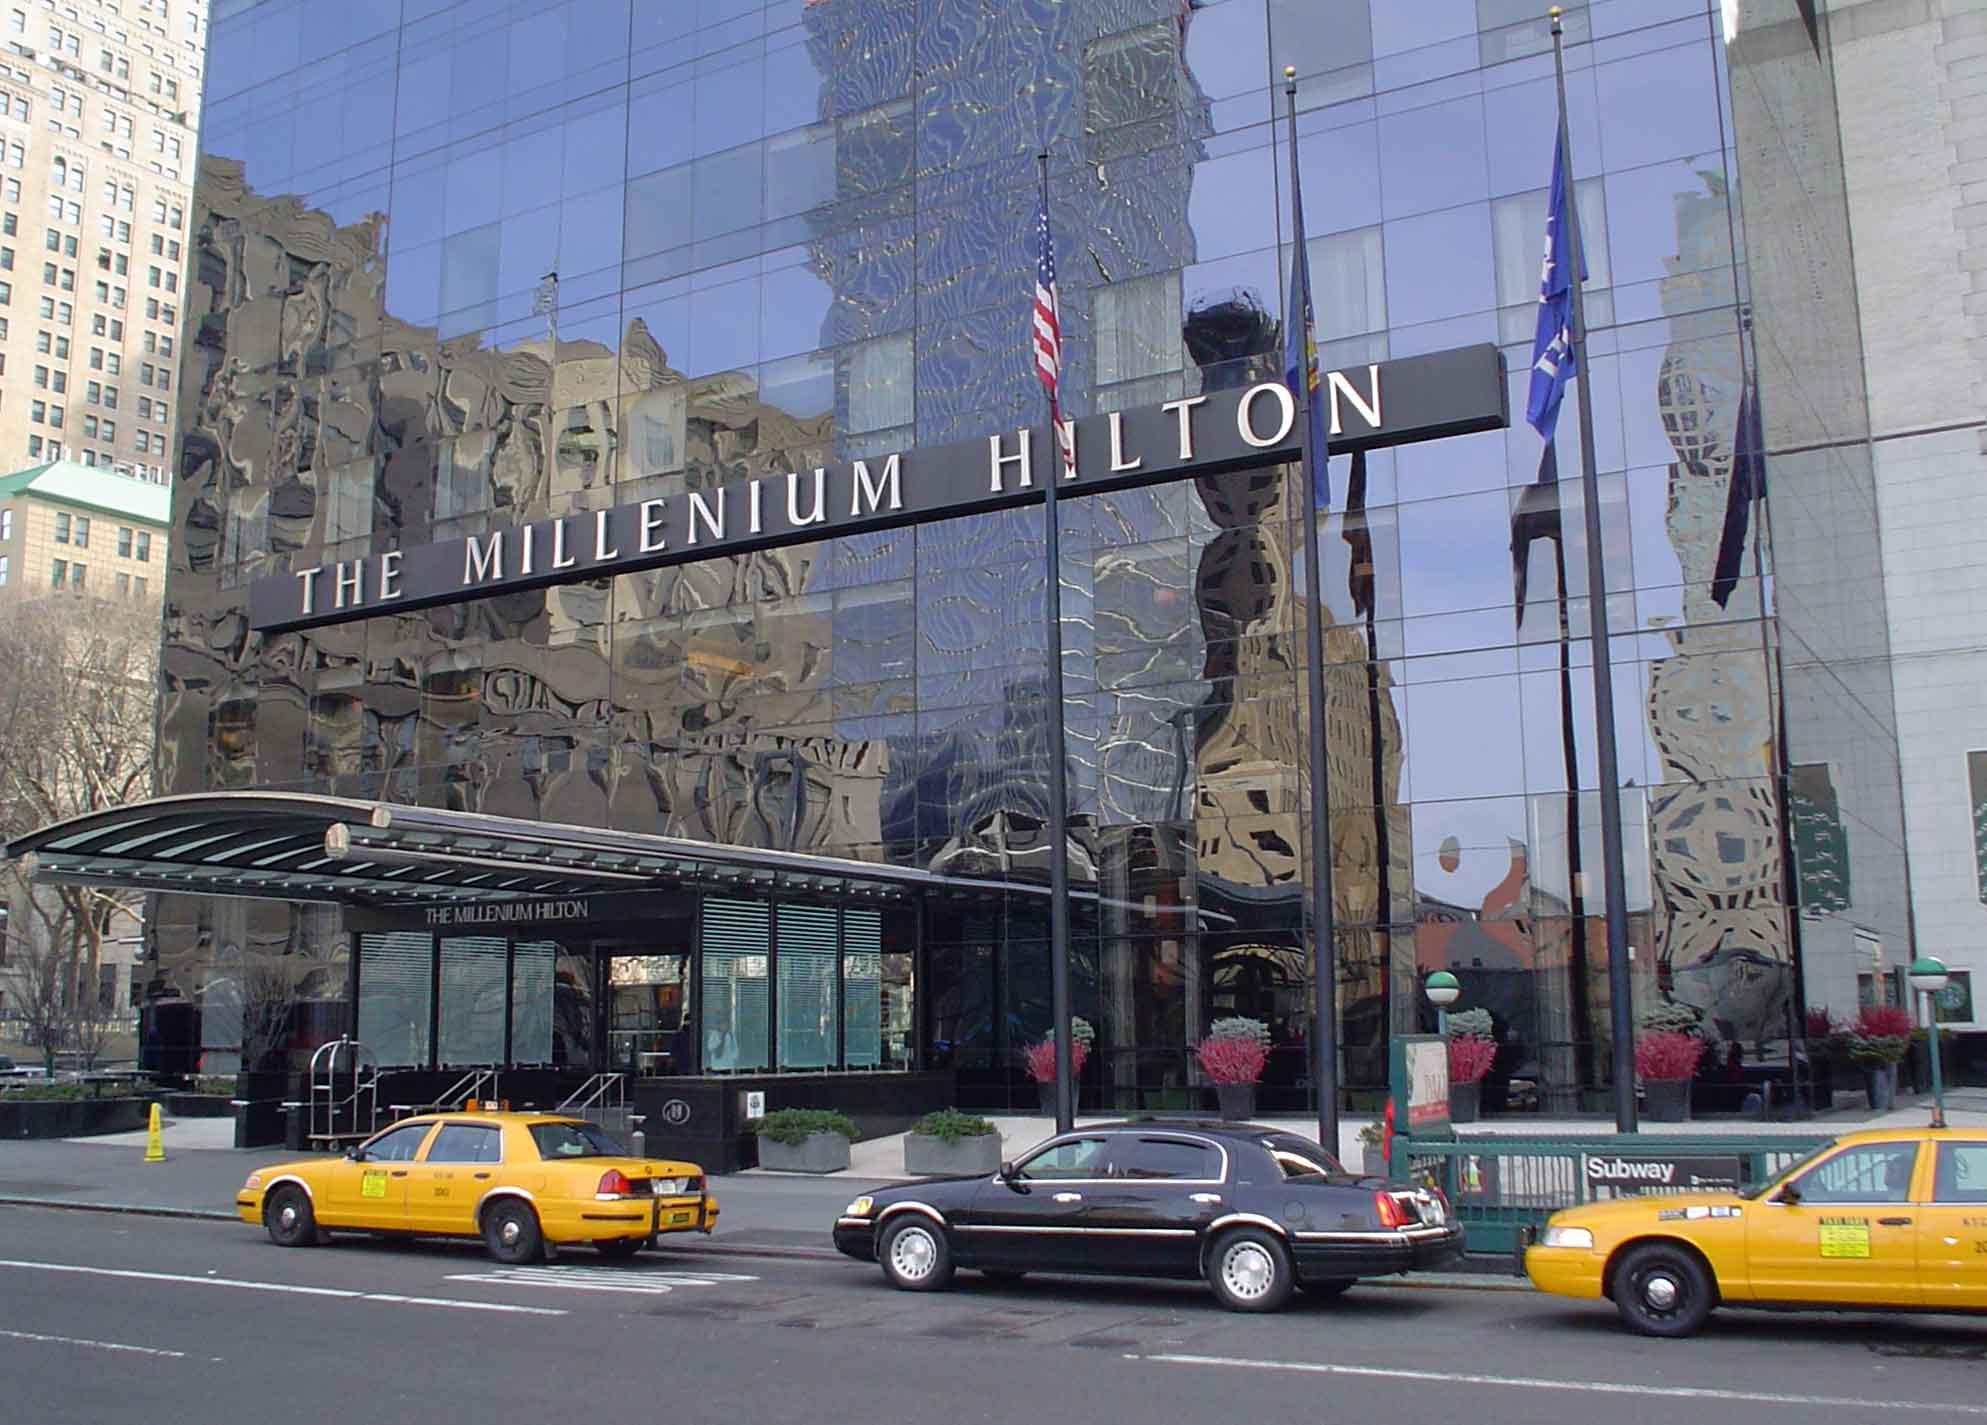 Millennium Hotel Hilton